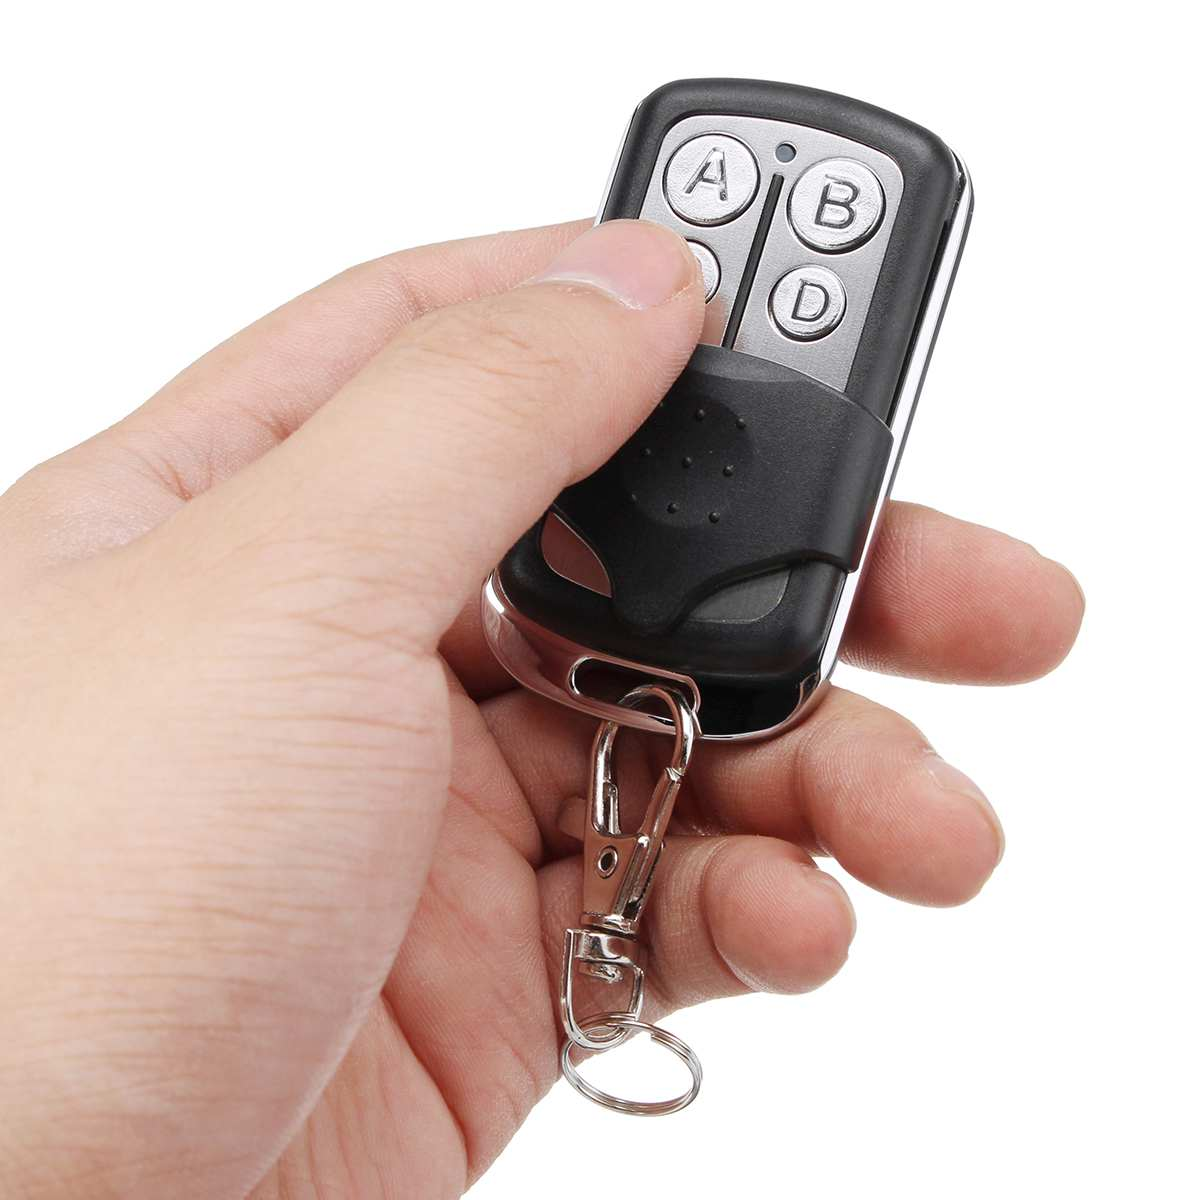 Mando a distancia para puerta de garaje 433,92 Mhz 9 DIP Interruptor para B/&D Accent CAD602 4332EBD Belupai